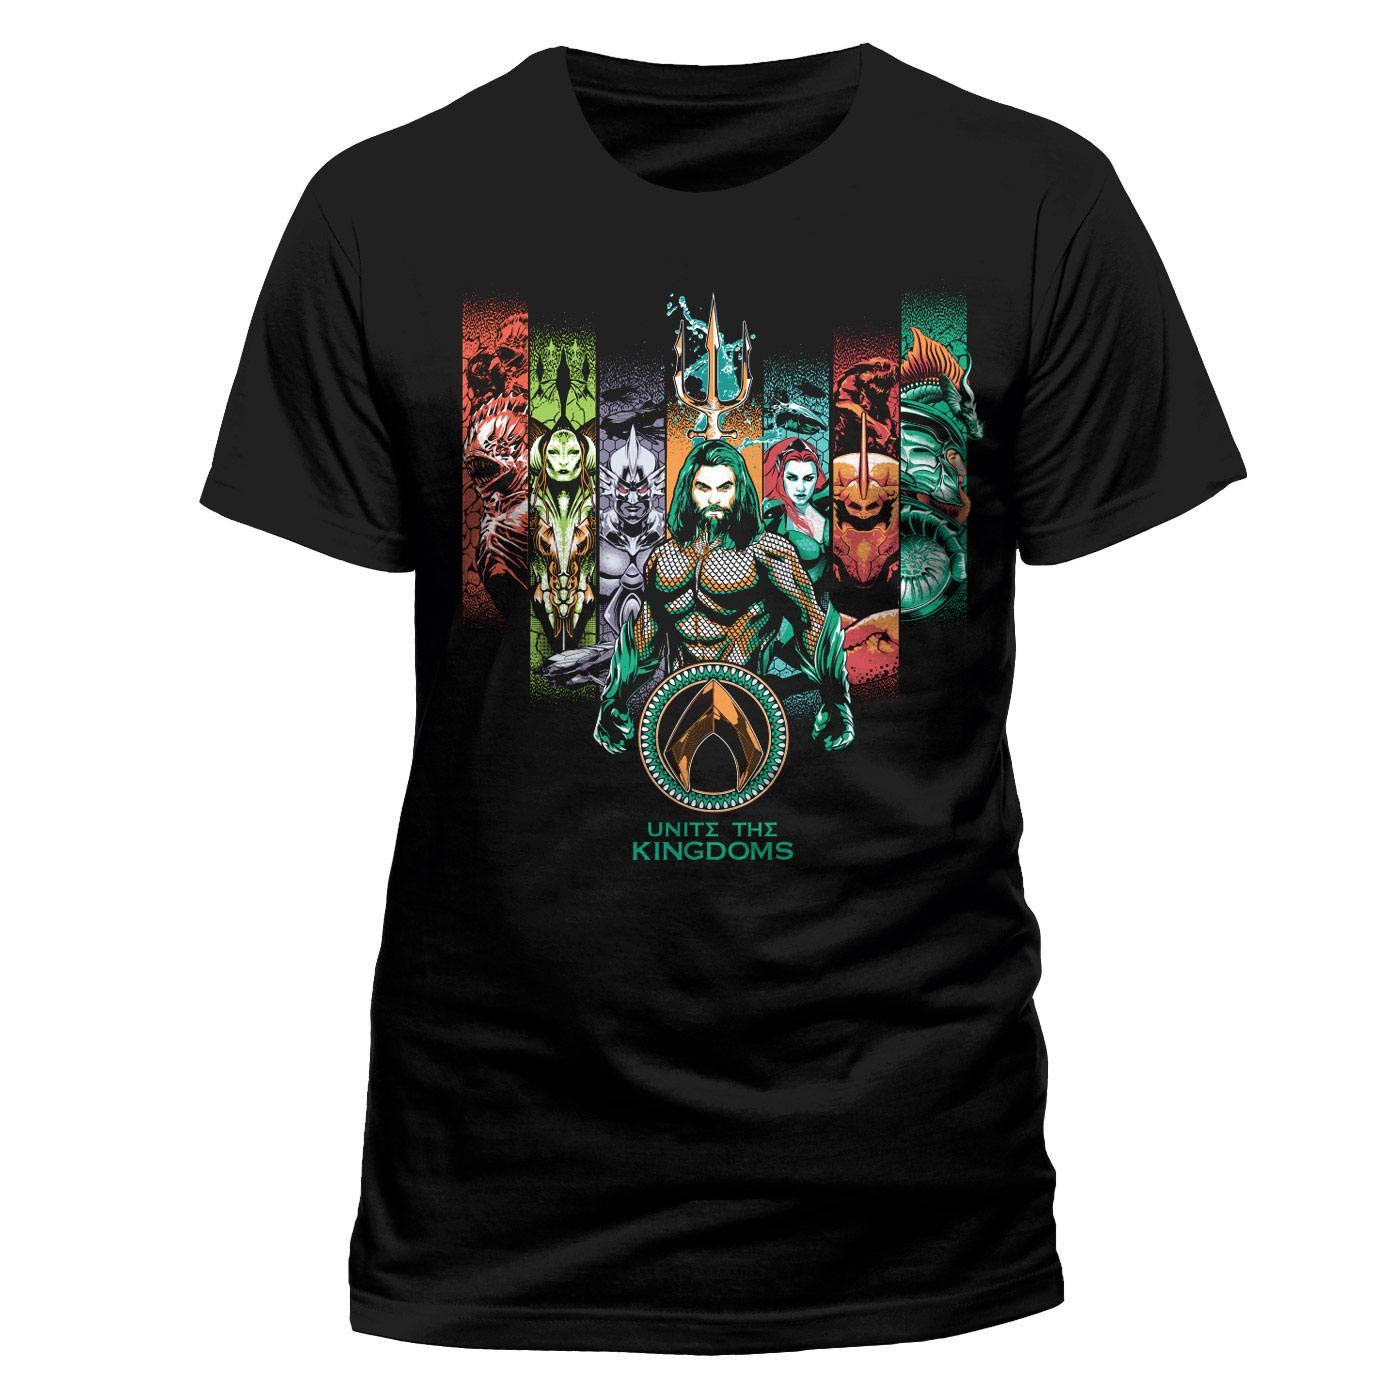 Aquaman Movie T-Shirt Unite The Kingdoms Size S